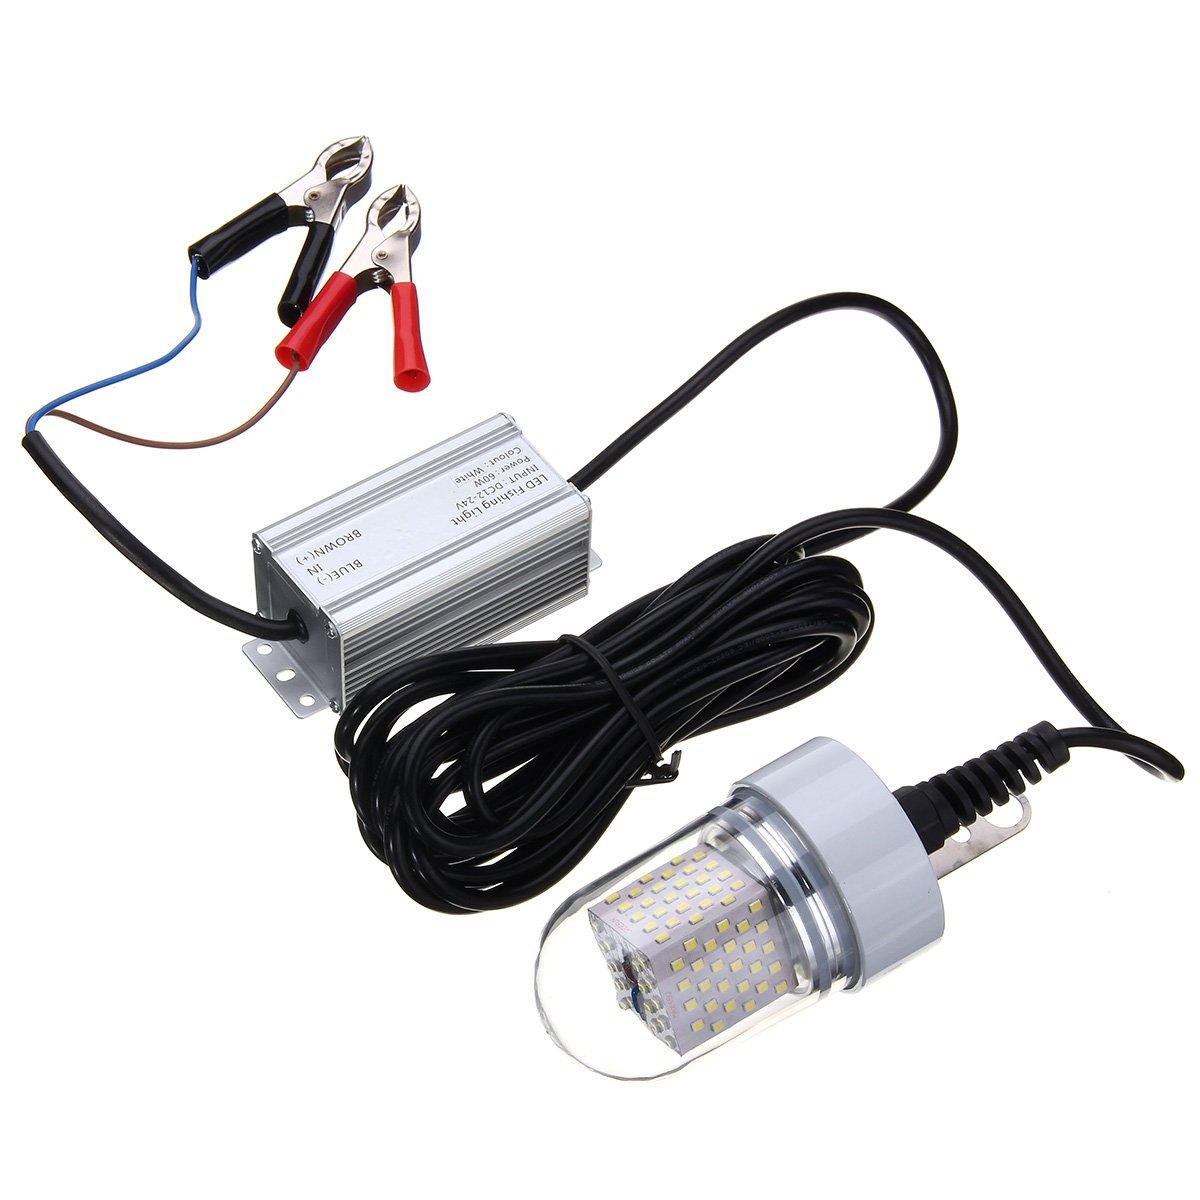 LEDMOMO 12V 15W LED Submersible Fishing Light Deep Drop Underwater Fish Finder Lamp (White)